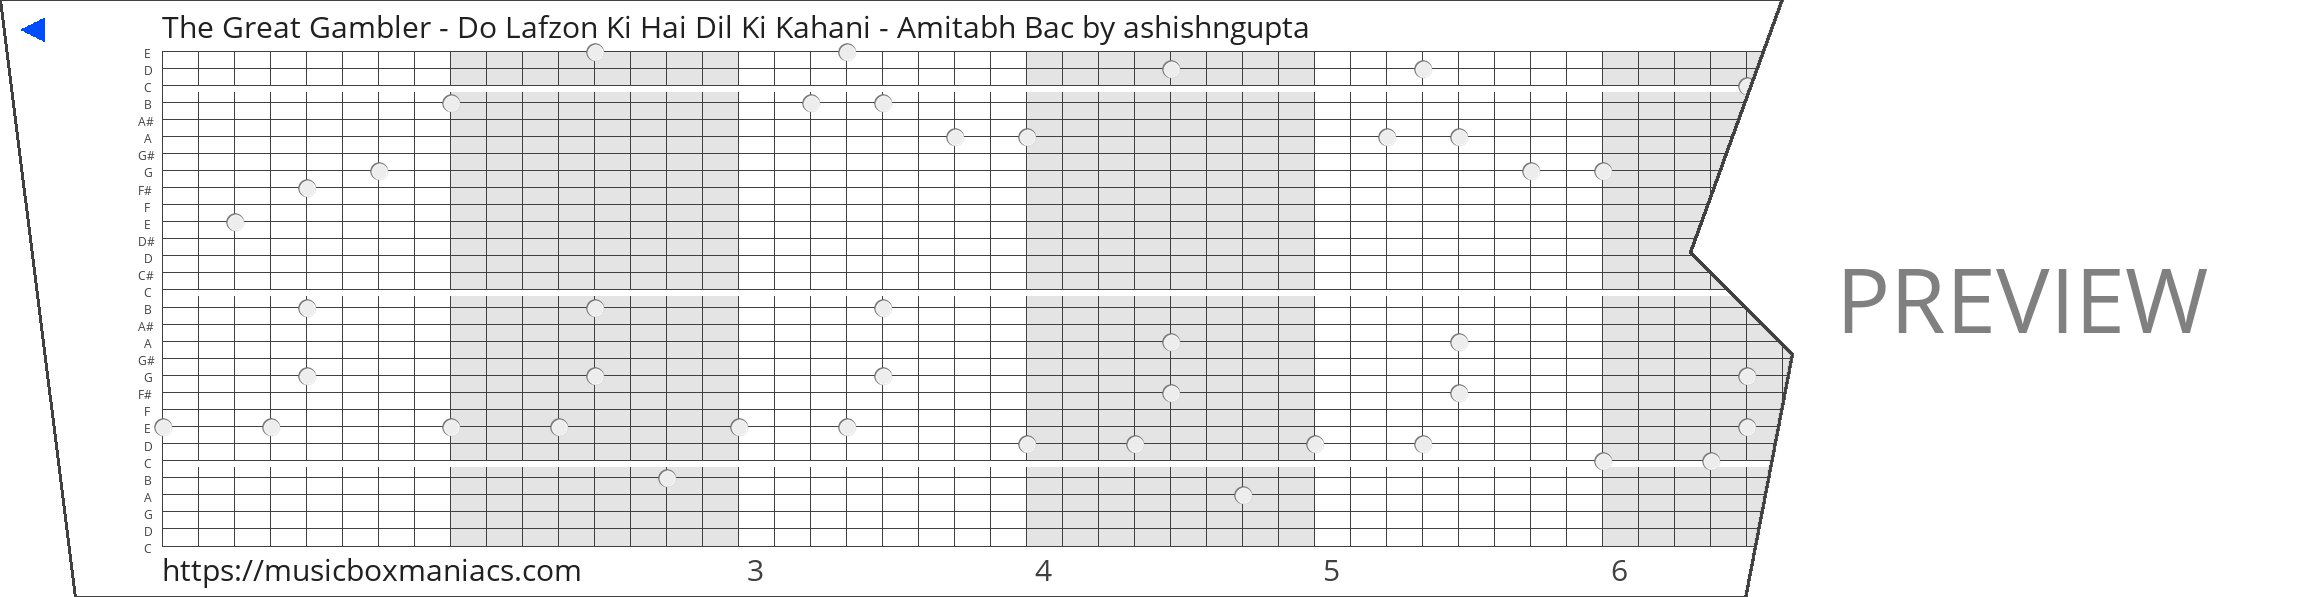 The Great Gambler - Do Lafzon Ki Hai Dil Ki Kahani - Amitabh Bac 30 note music box paper strip